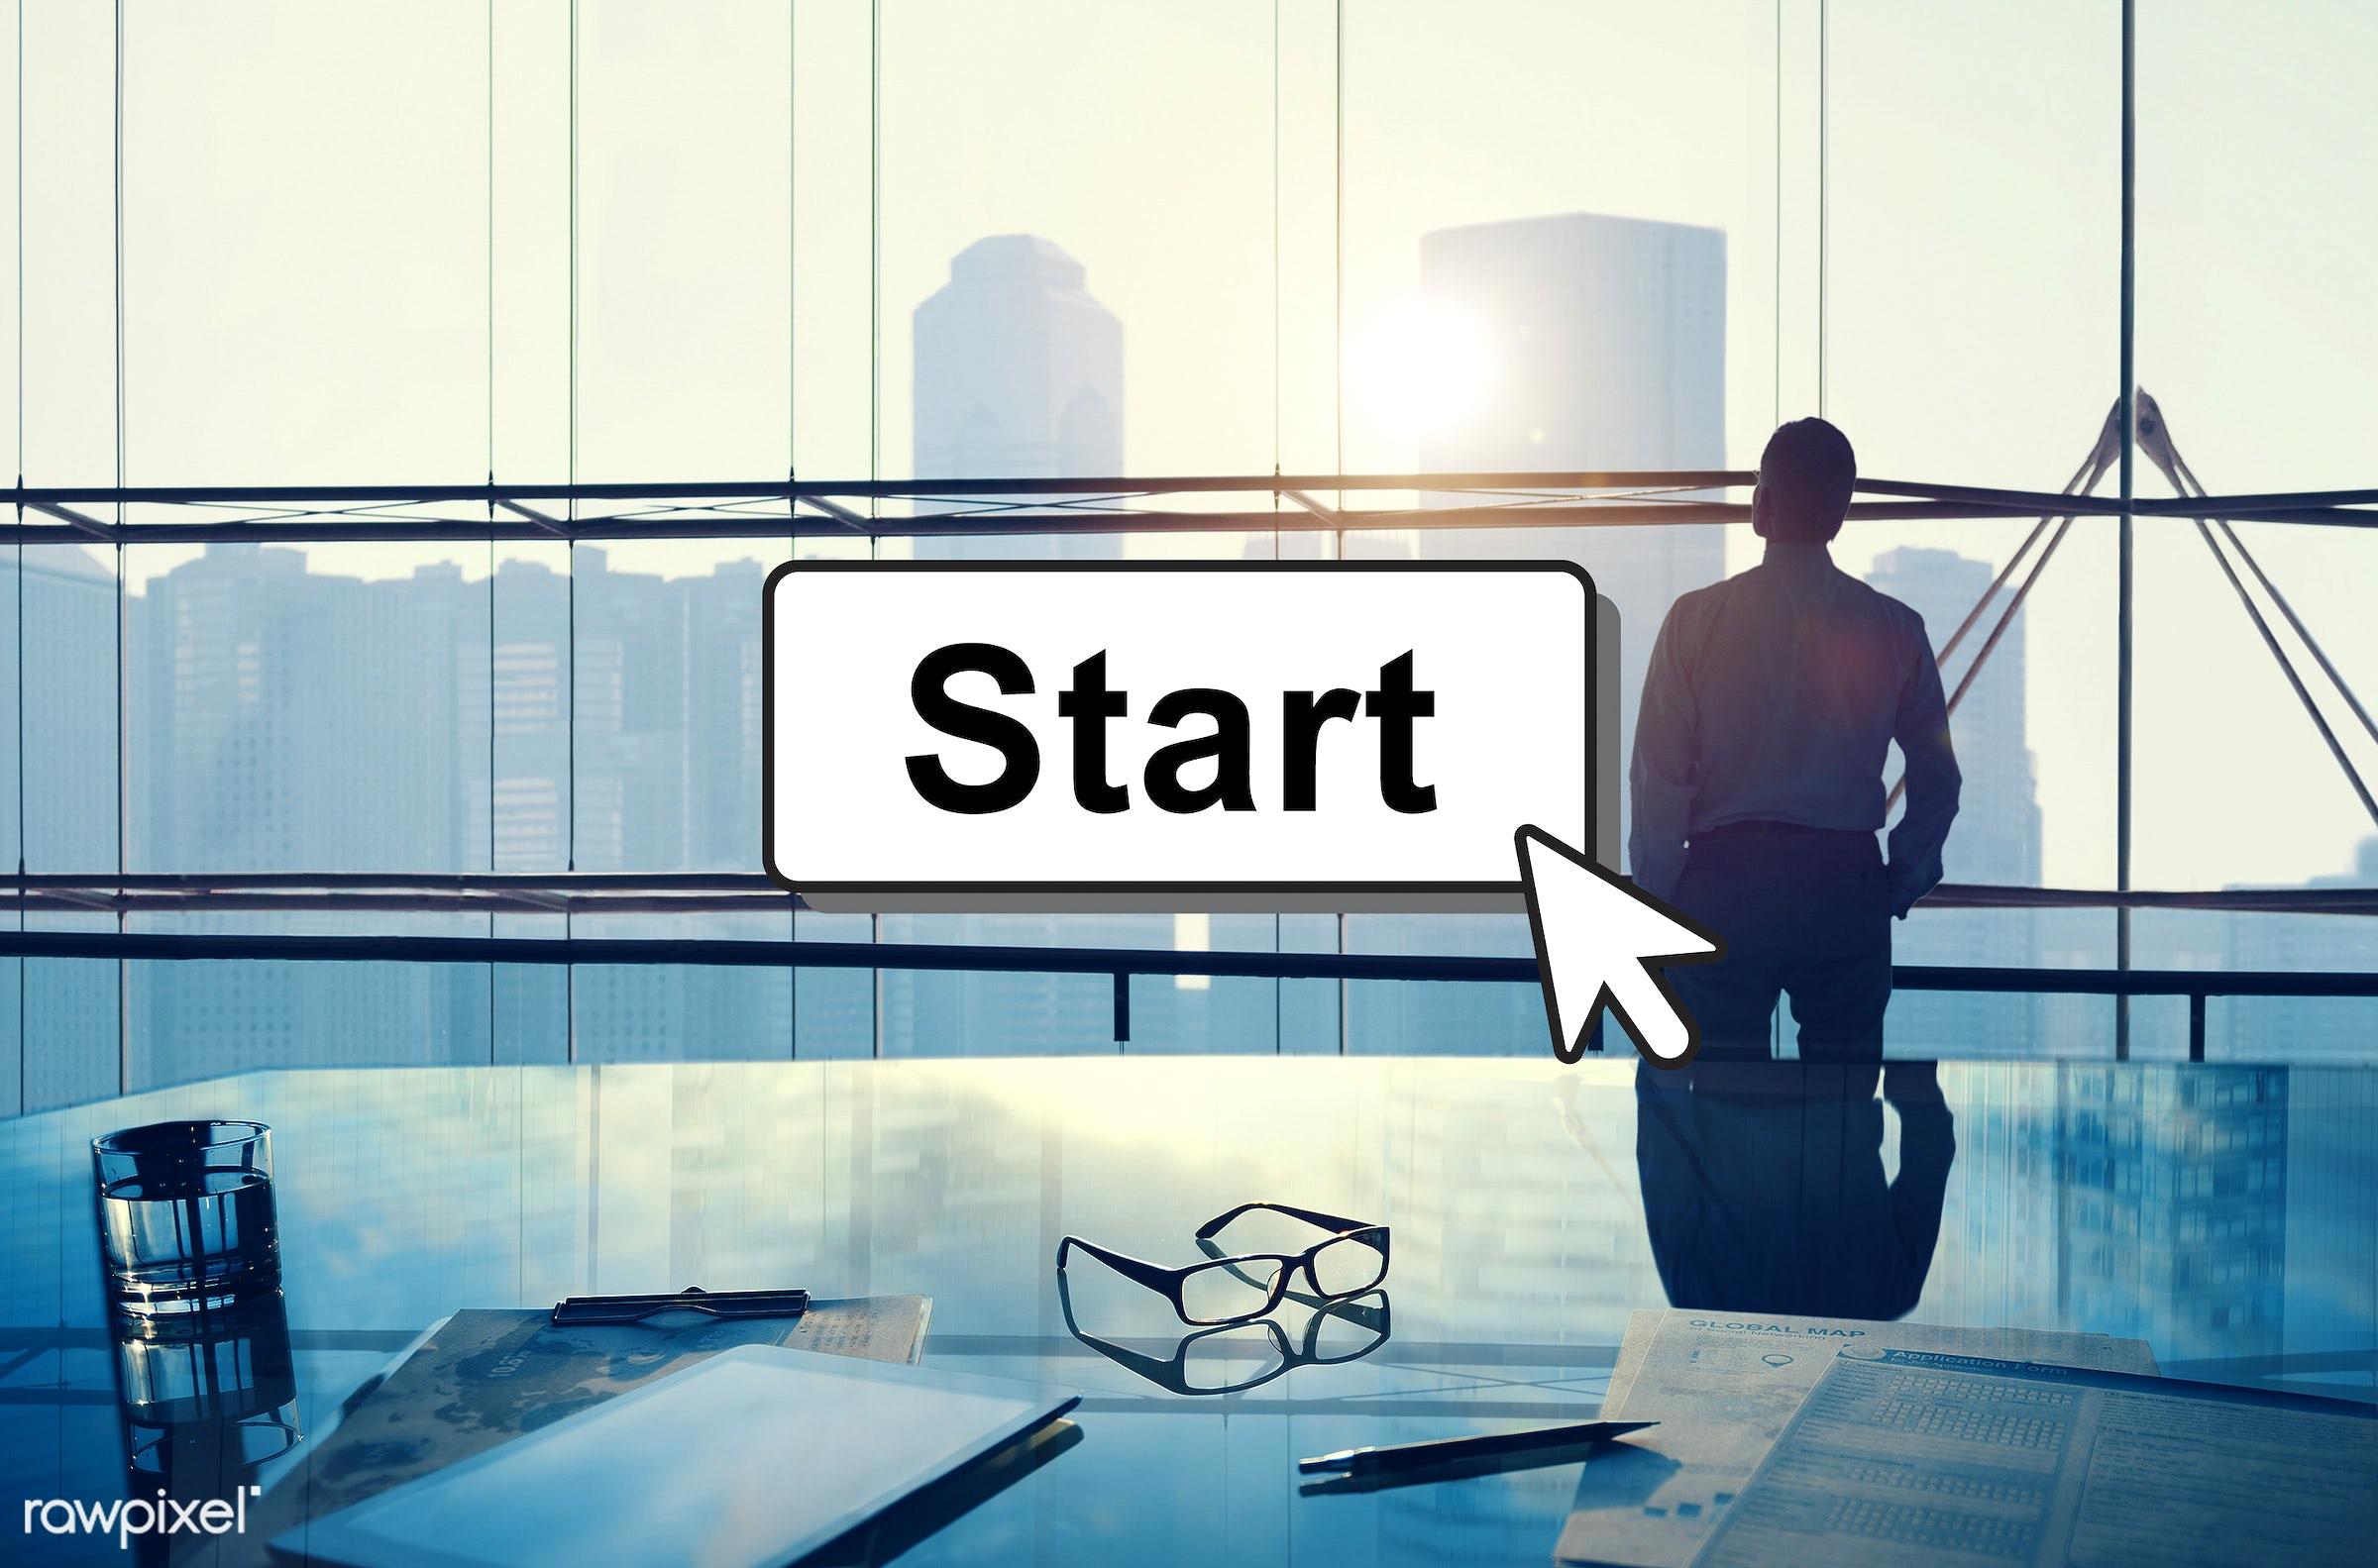 activation, alone, aspiration, back lit, begin, beginning, build, buildings, business, businessman, city, contemplation,...